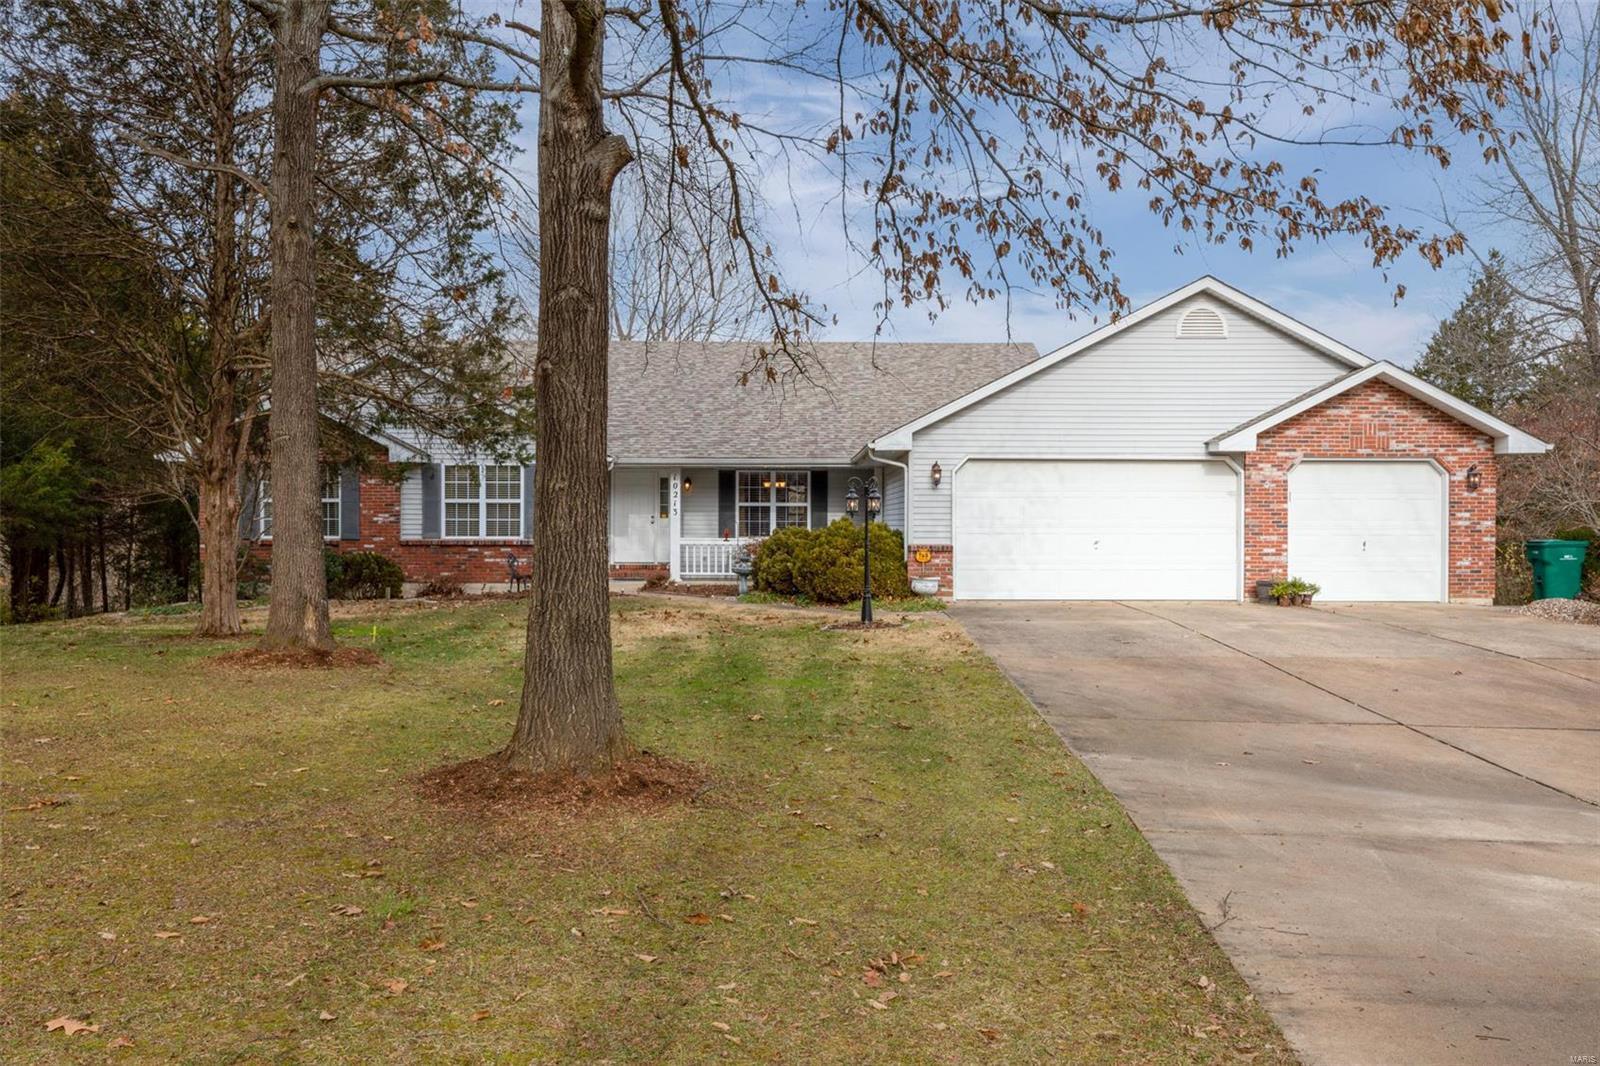 10213 Huntington Ridge Property Photo - Unincorporated, MO real estate listing